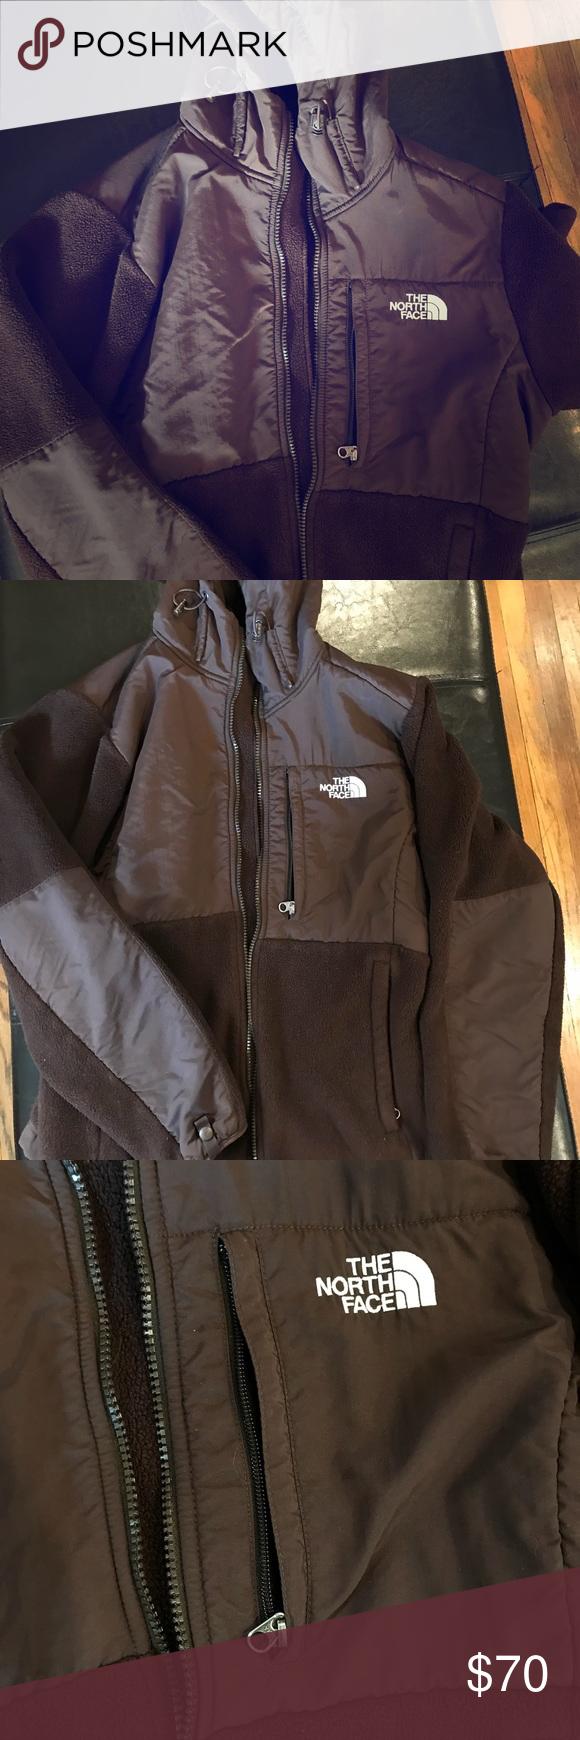 North Face Brown Denali Jacket Hoodie North Face Fleece Jacket Brown North Face Jackets [ 1740 x 580 Pixel ]